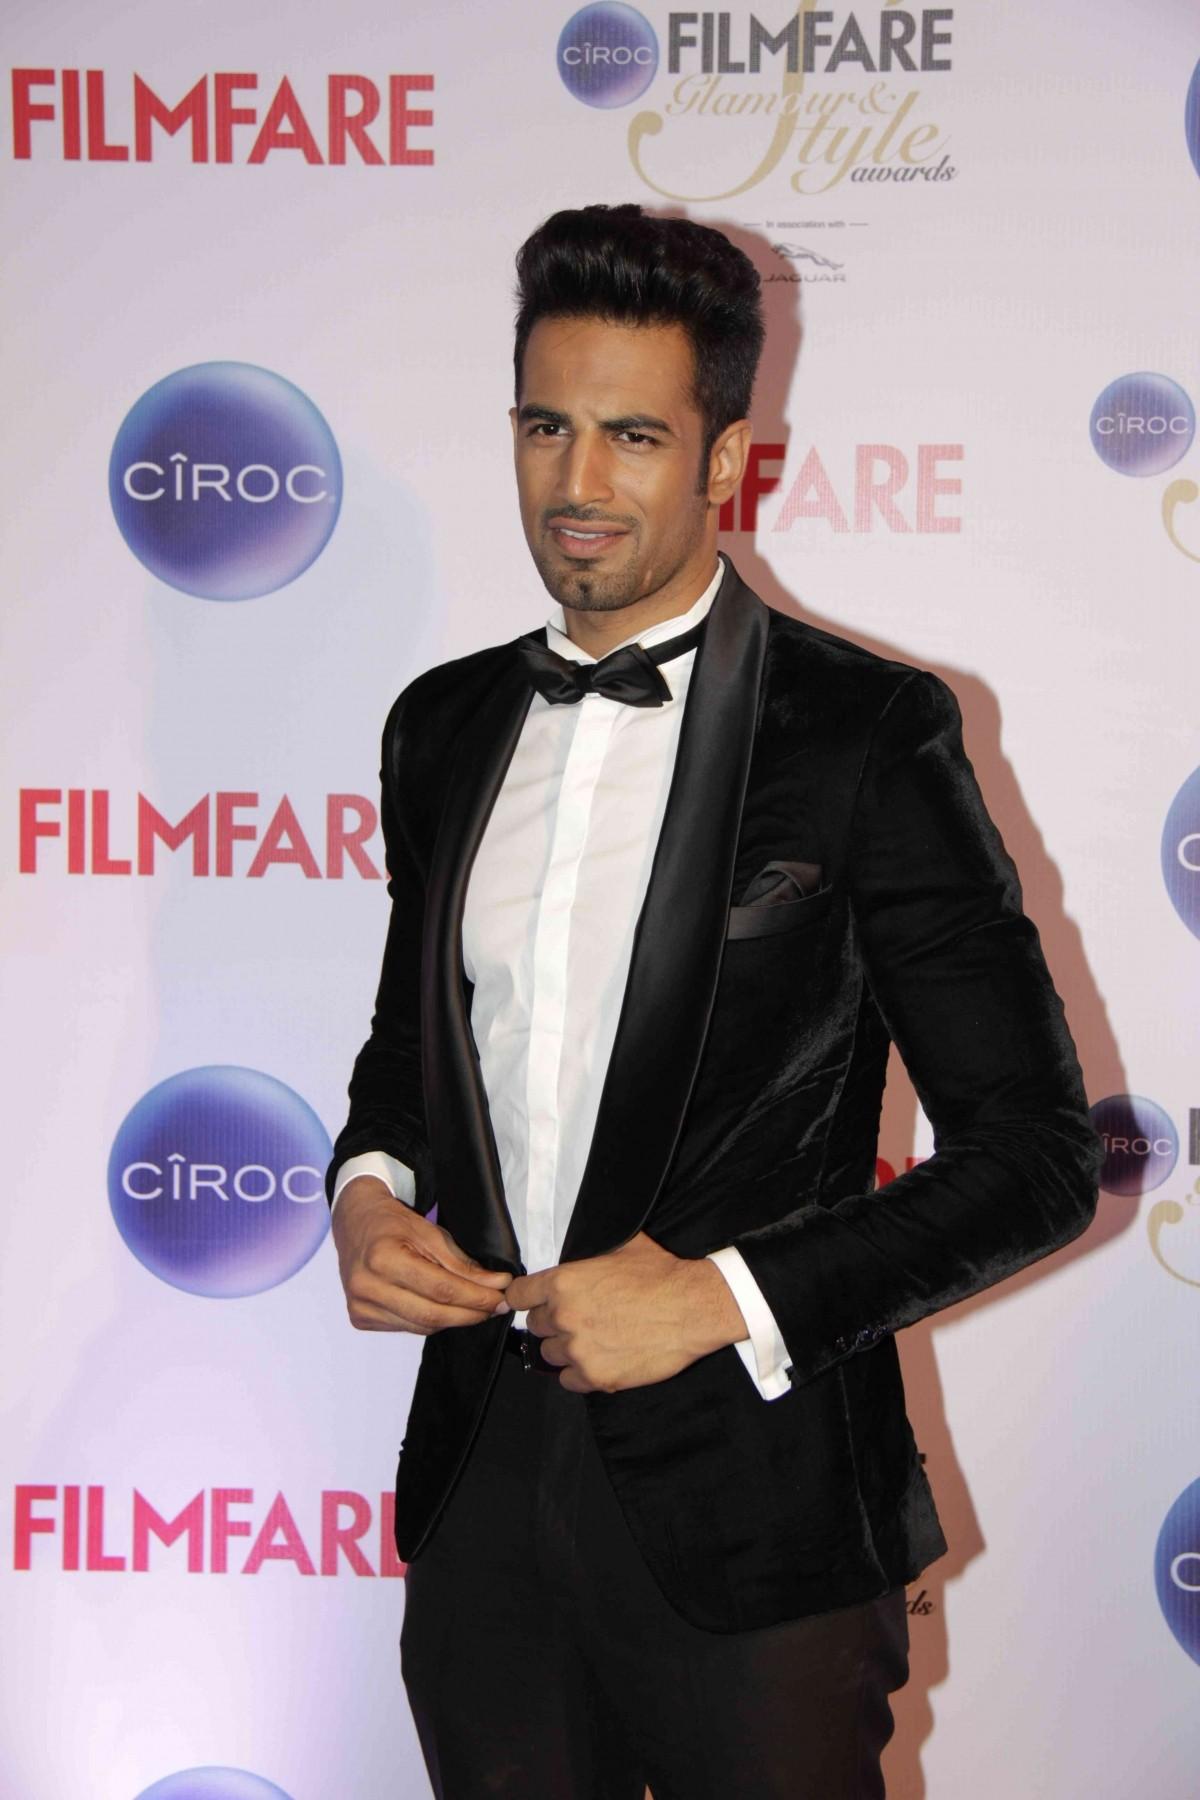 Filmfare Glamorous And Style 2015: Akshay Kumar, Big B, Sidharth Malhotra and Other Handsome Hunks Walked The Red Carpet